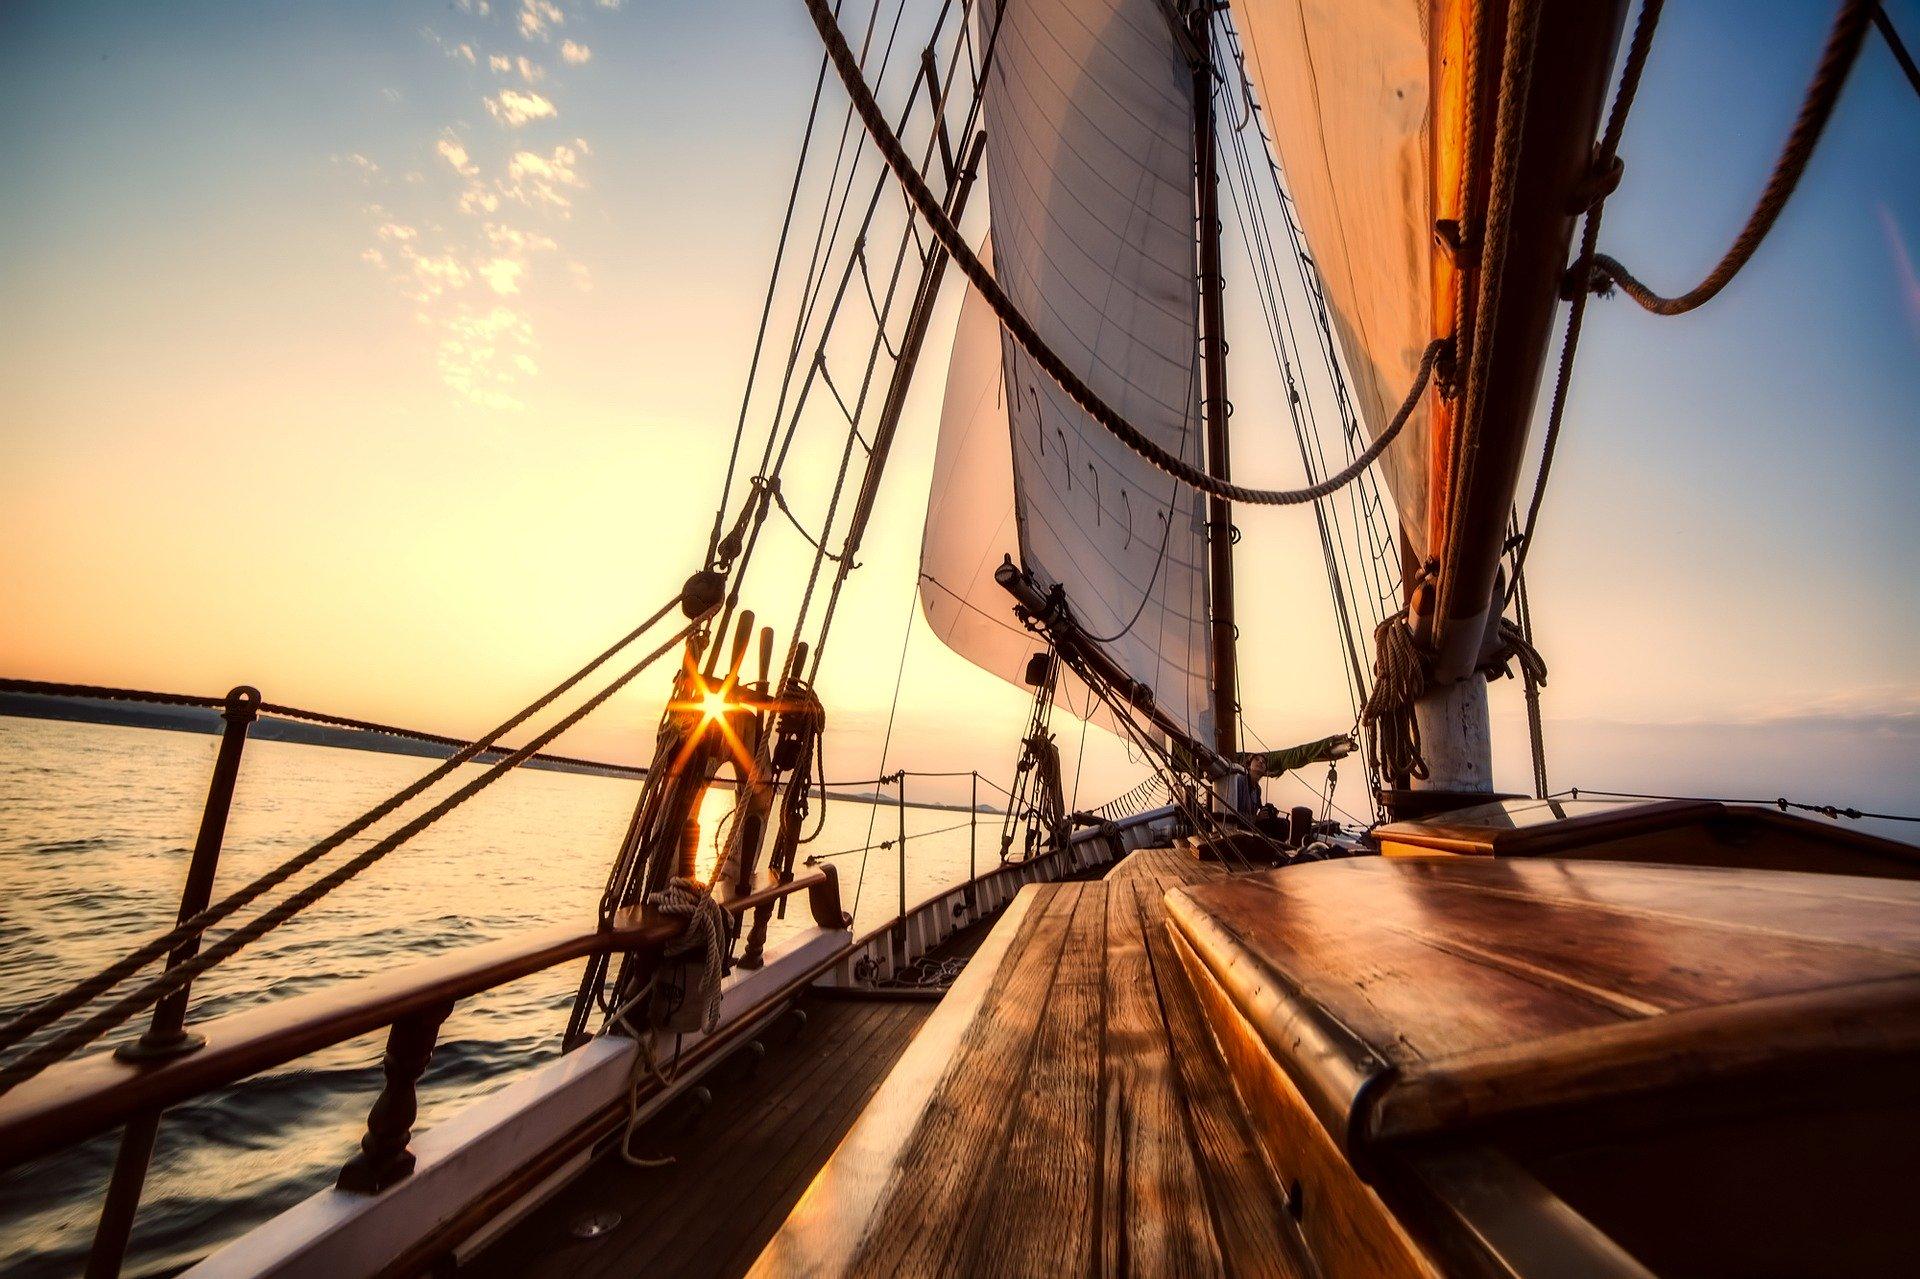 Sunset sailing on a luxury sailing yacht